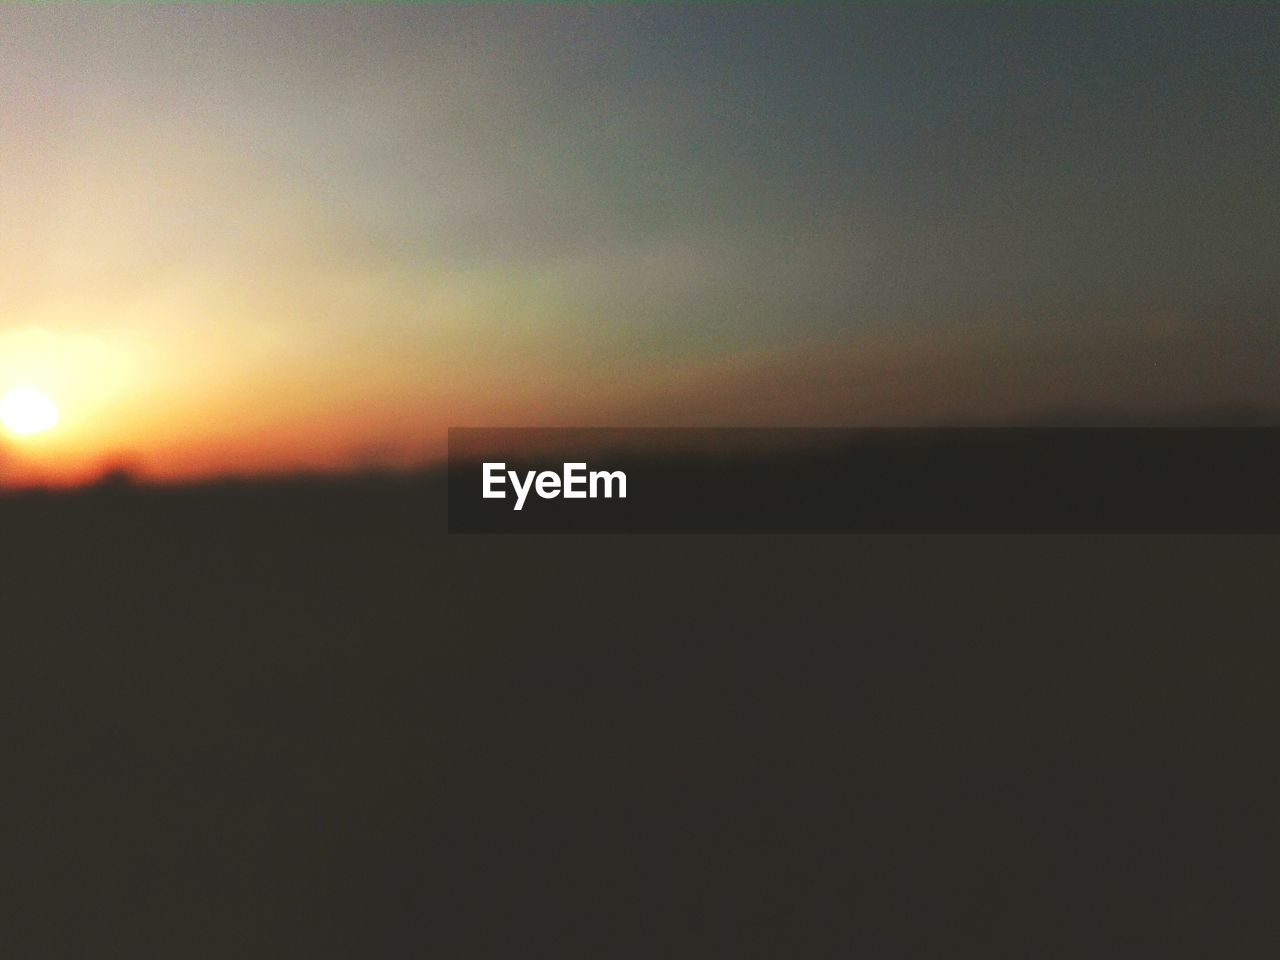 sunset, sky, tranquility, beauty in nature, scenics - nature, tranquil scene, silhouette, nature, orange color, landscape, environment, copy space, sun, no people, outdoors, idyllic, cloud - sky, non-urban scene, horizon, dusk